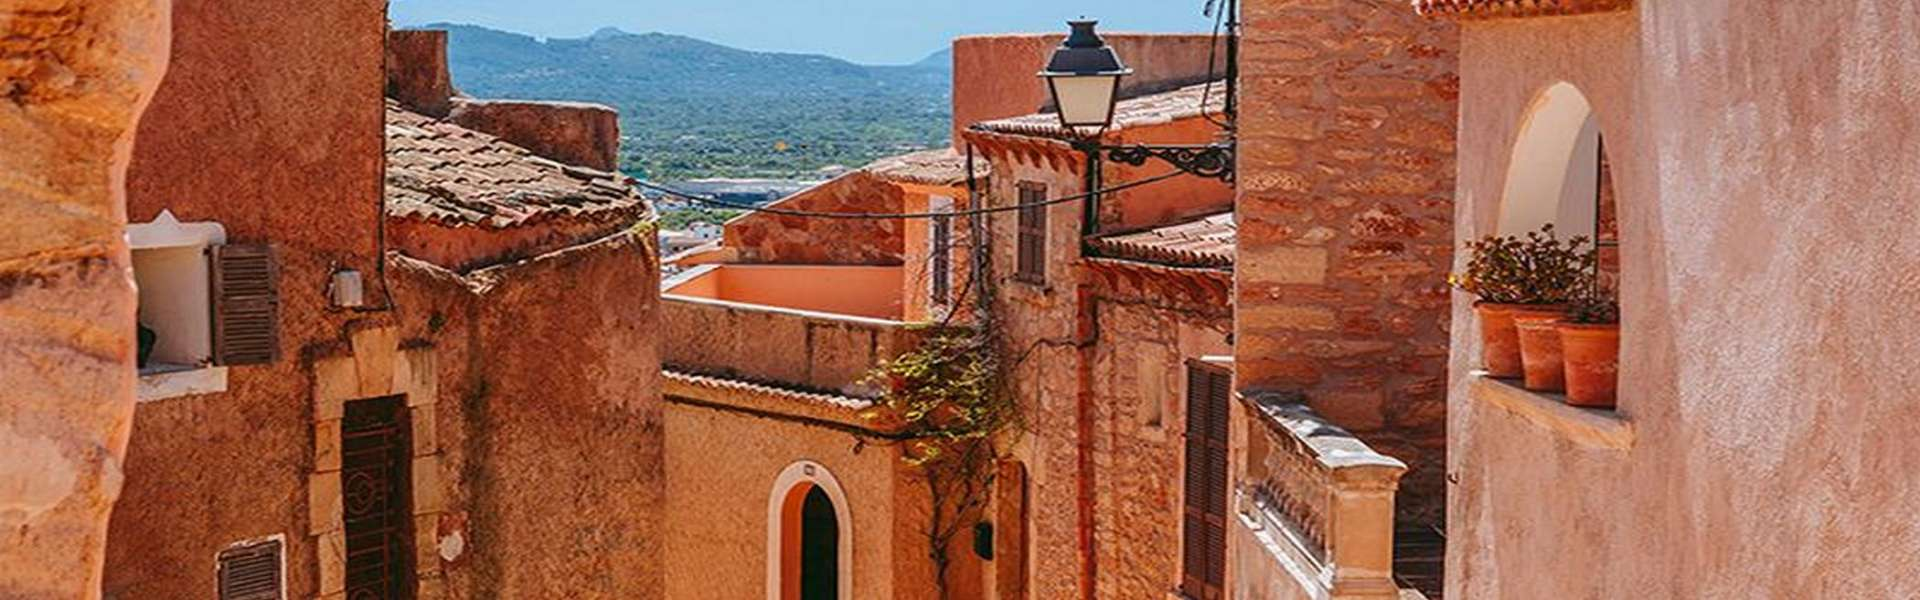 Capdepera/Sa Font de Sa Cala - Apartments & Penthouses in privileged location